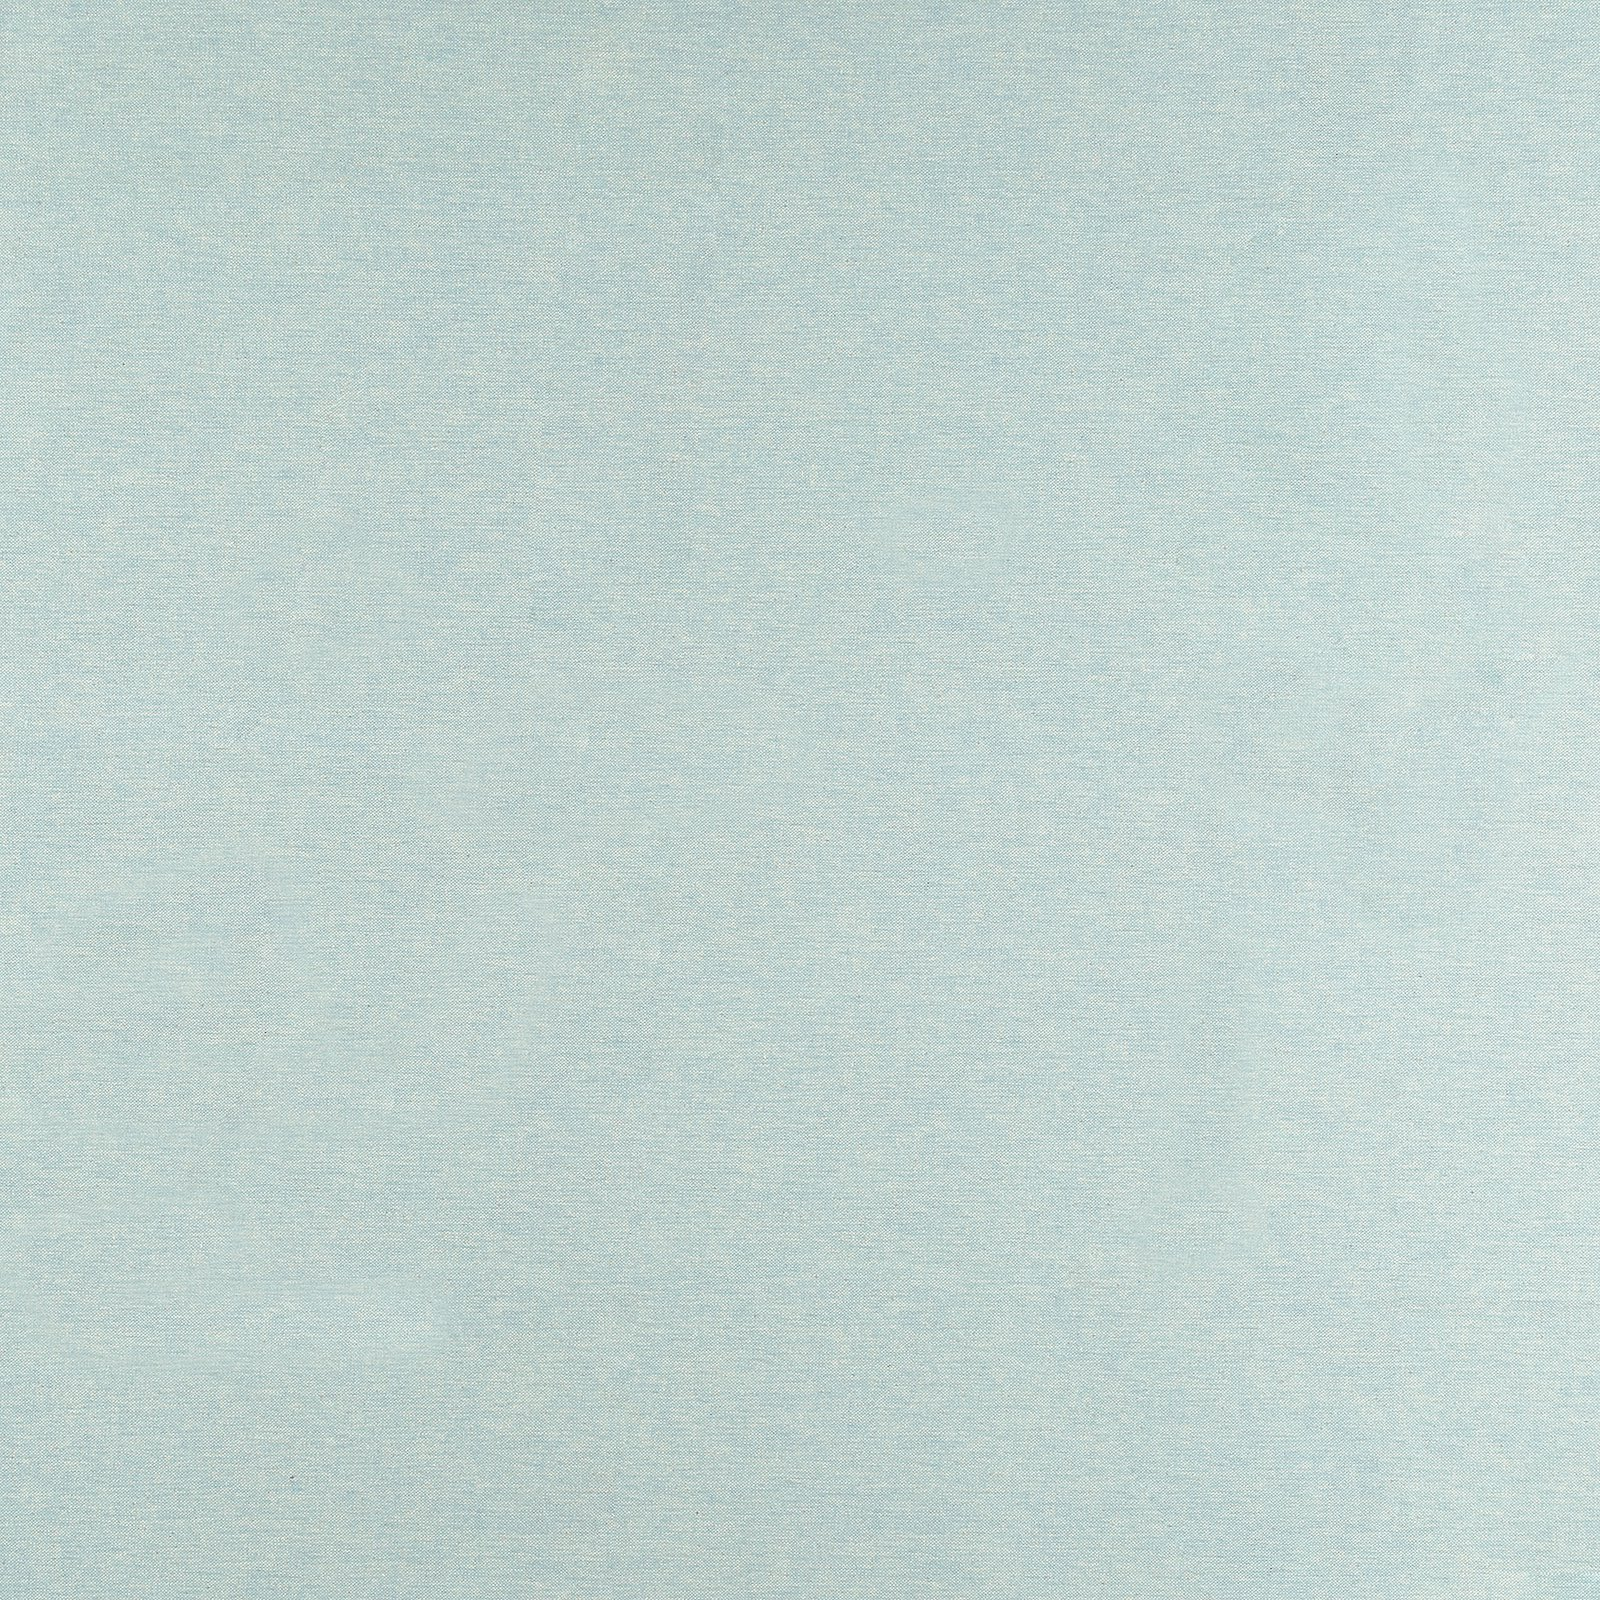 Woven oilcloth linen look/light blue 872302_pack_solid